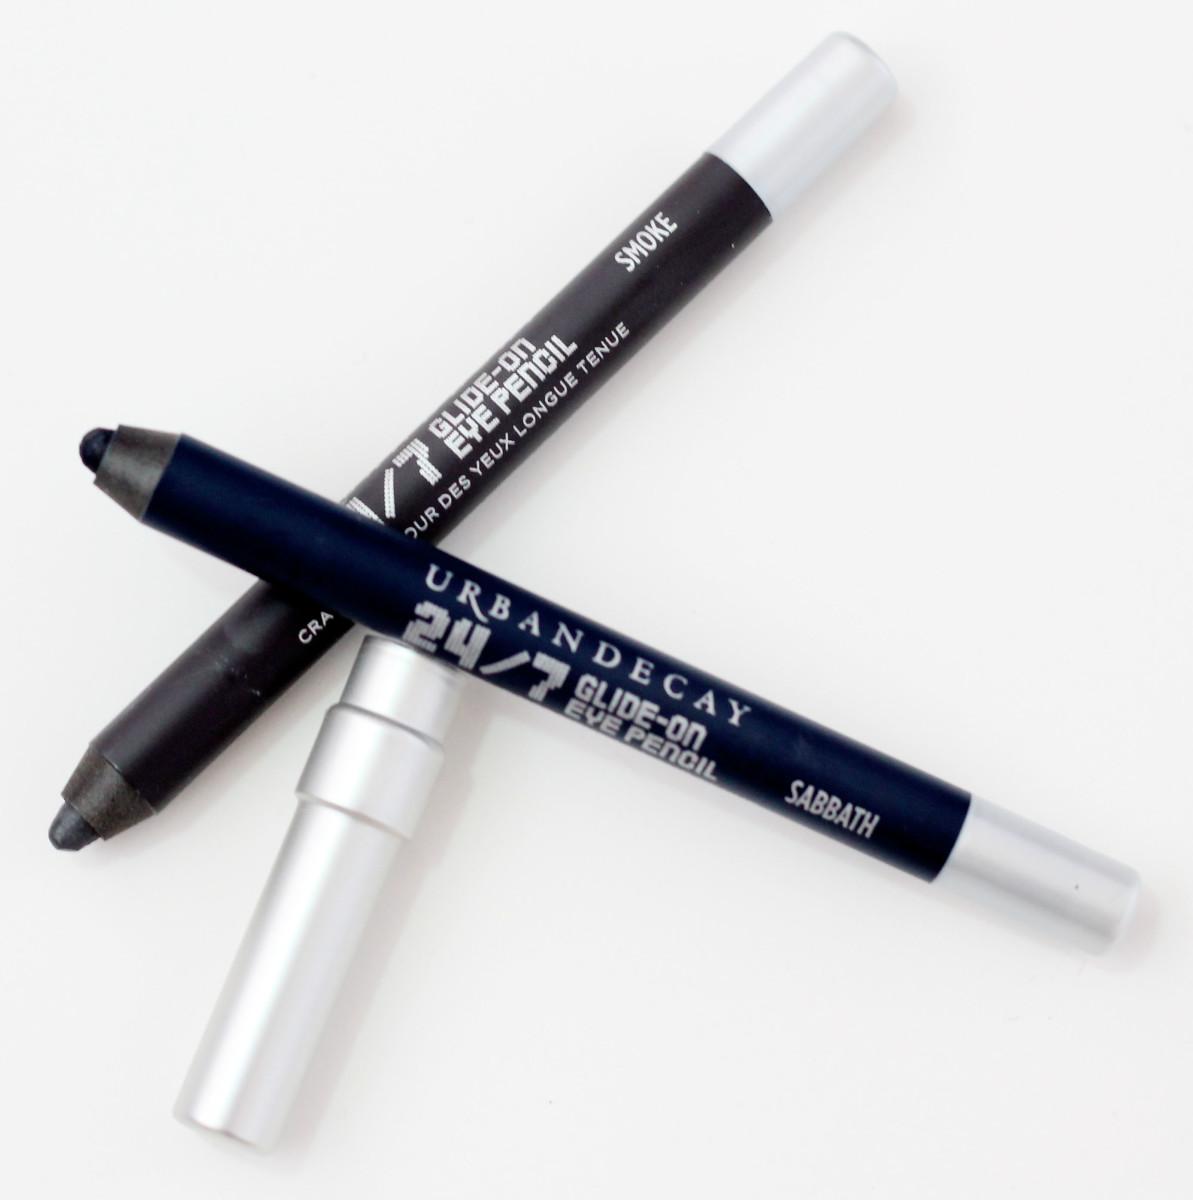 Urban Decay 24/7 Glide-On Eye Pencils in Smoke and Sabbath